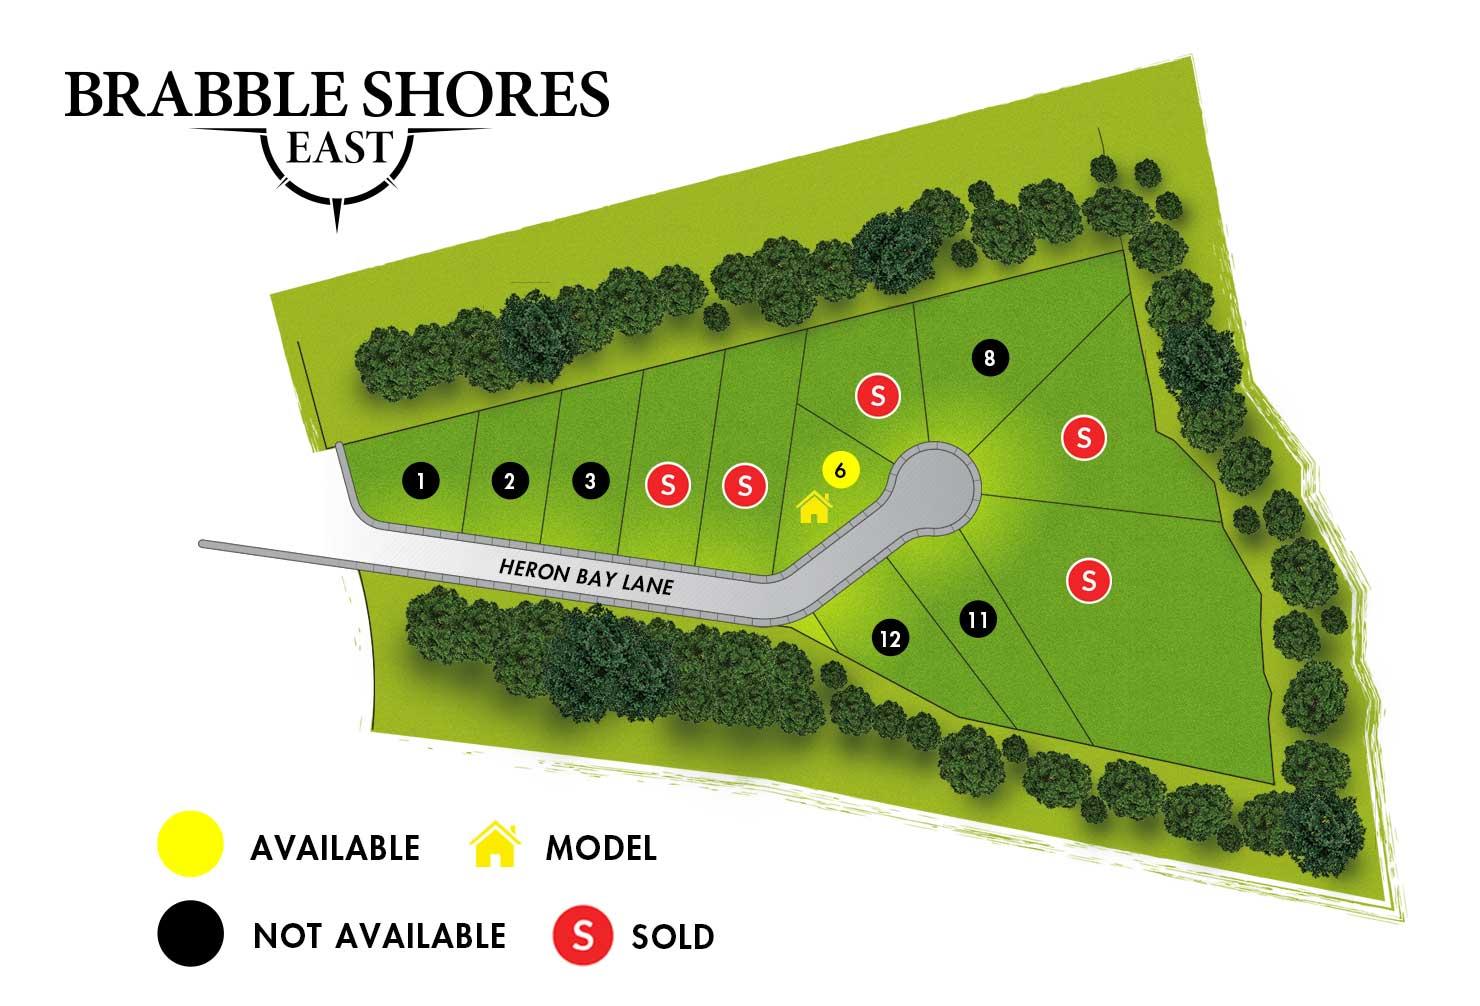 Brabble Shores East Map